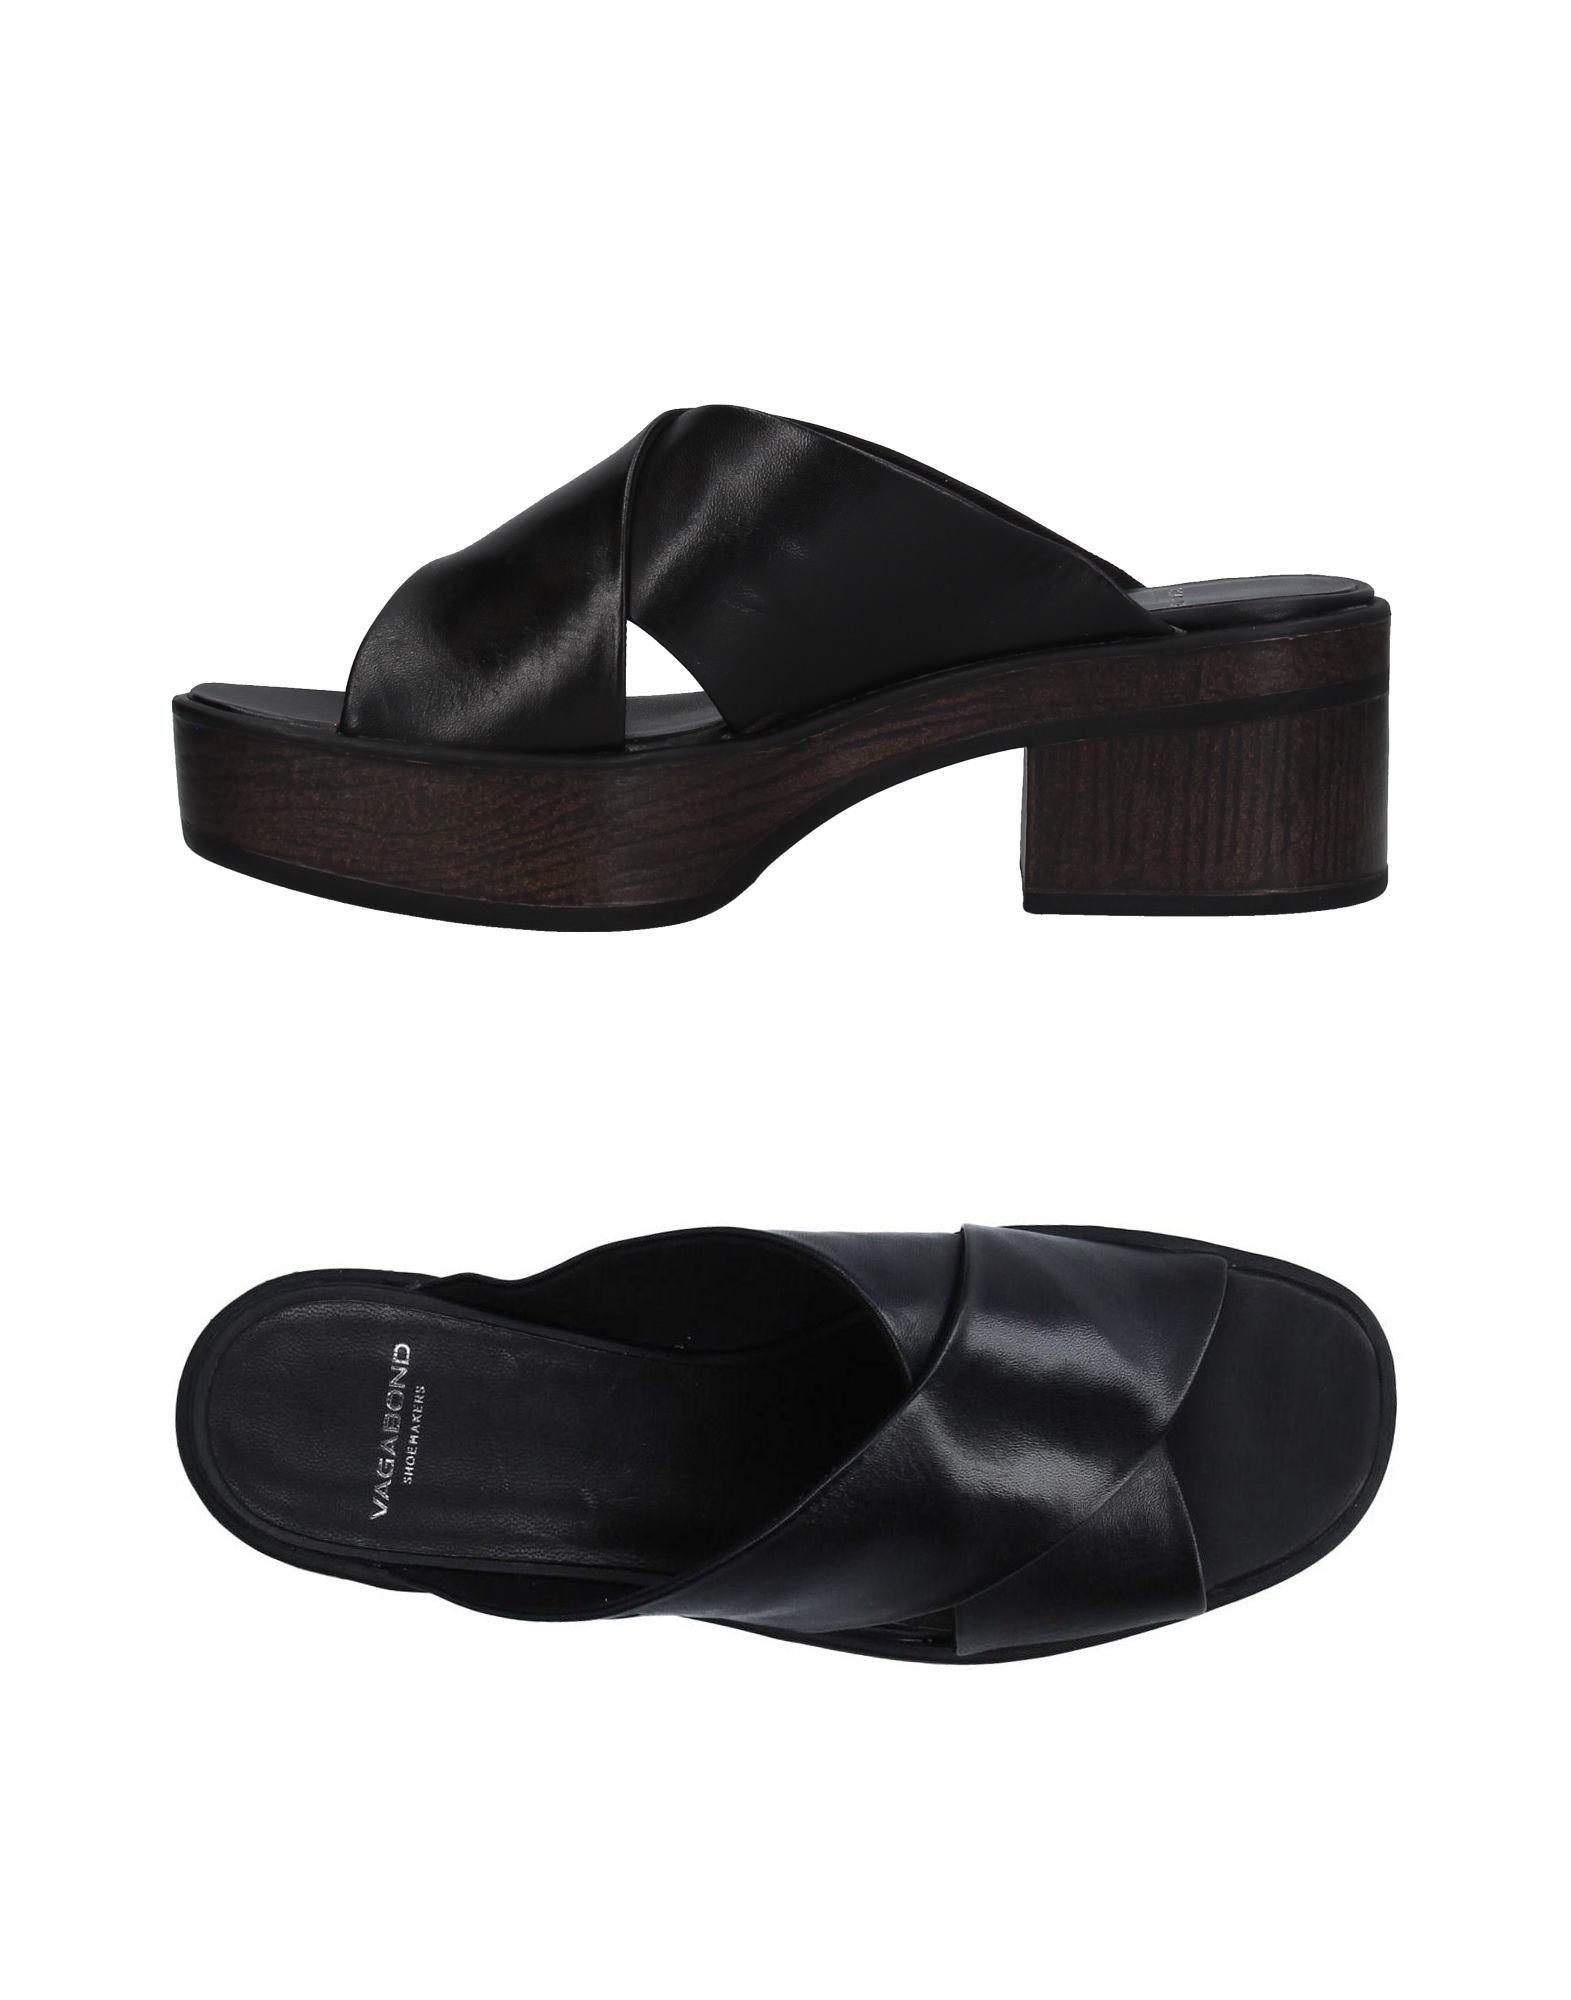 Sandali Vagabond Shoemakers Donna - Acquista online su